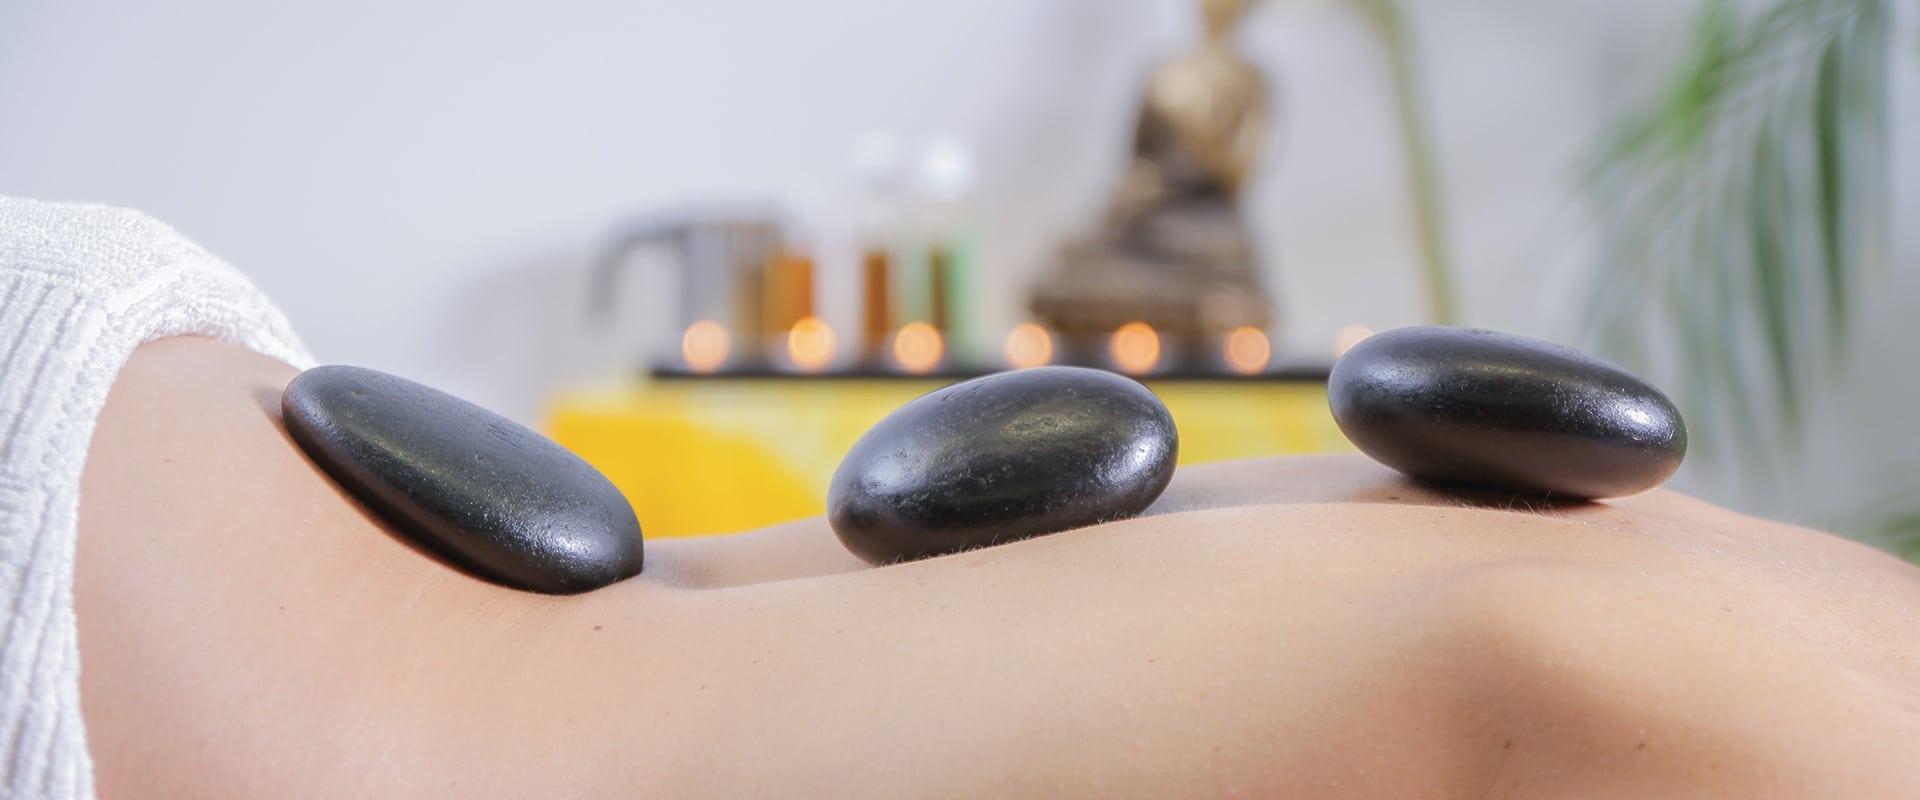 massage-pierres-chaudes-institut-de-beaute-absolu-institut-gaillard-haute-savoie-geneve